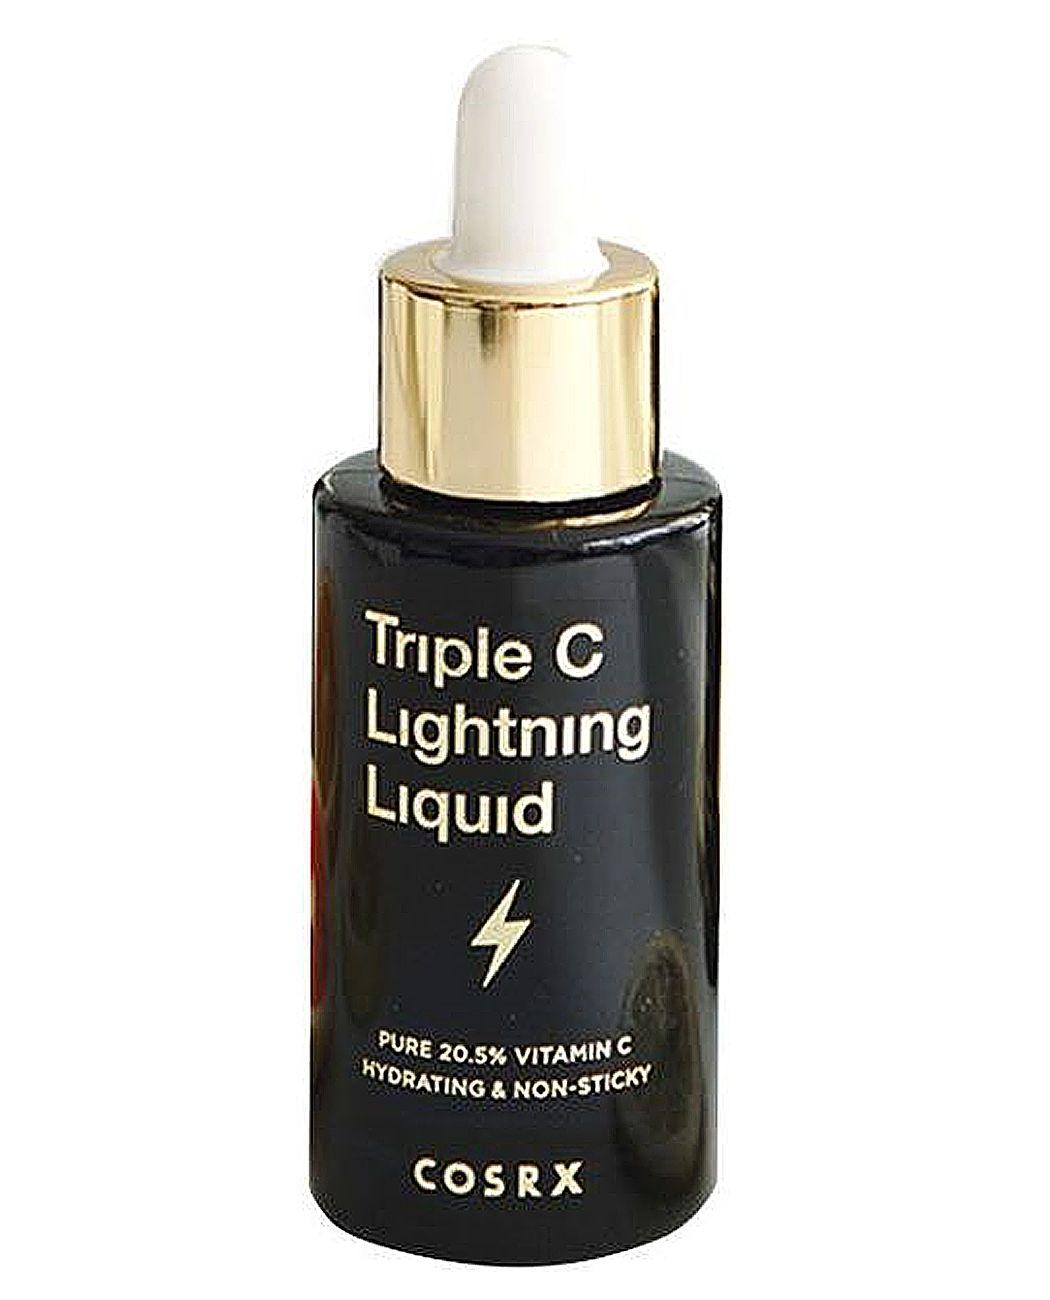 Cosrx Triple G Lighting Liquid Pinterest Benton Snail Bee High Content Essence 5 Gram